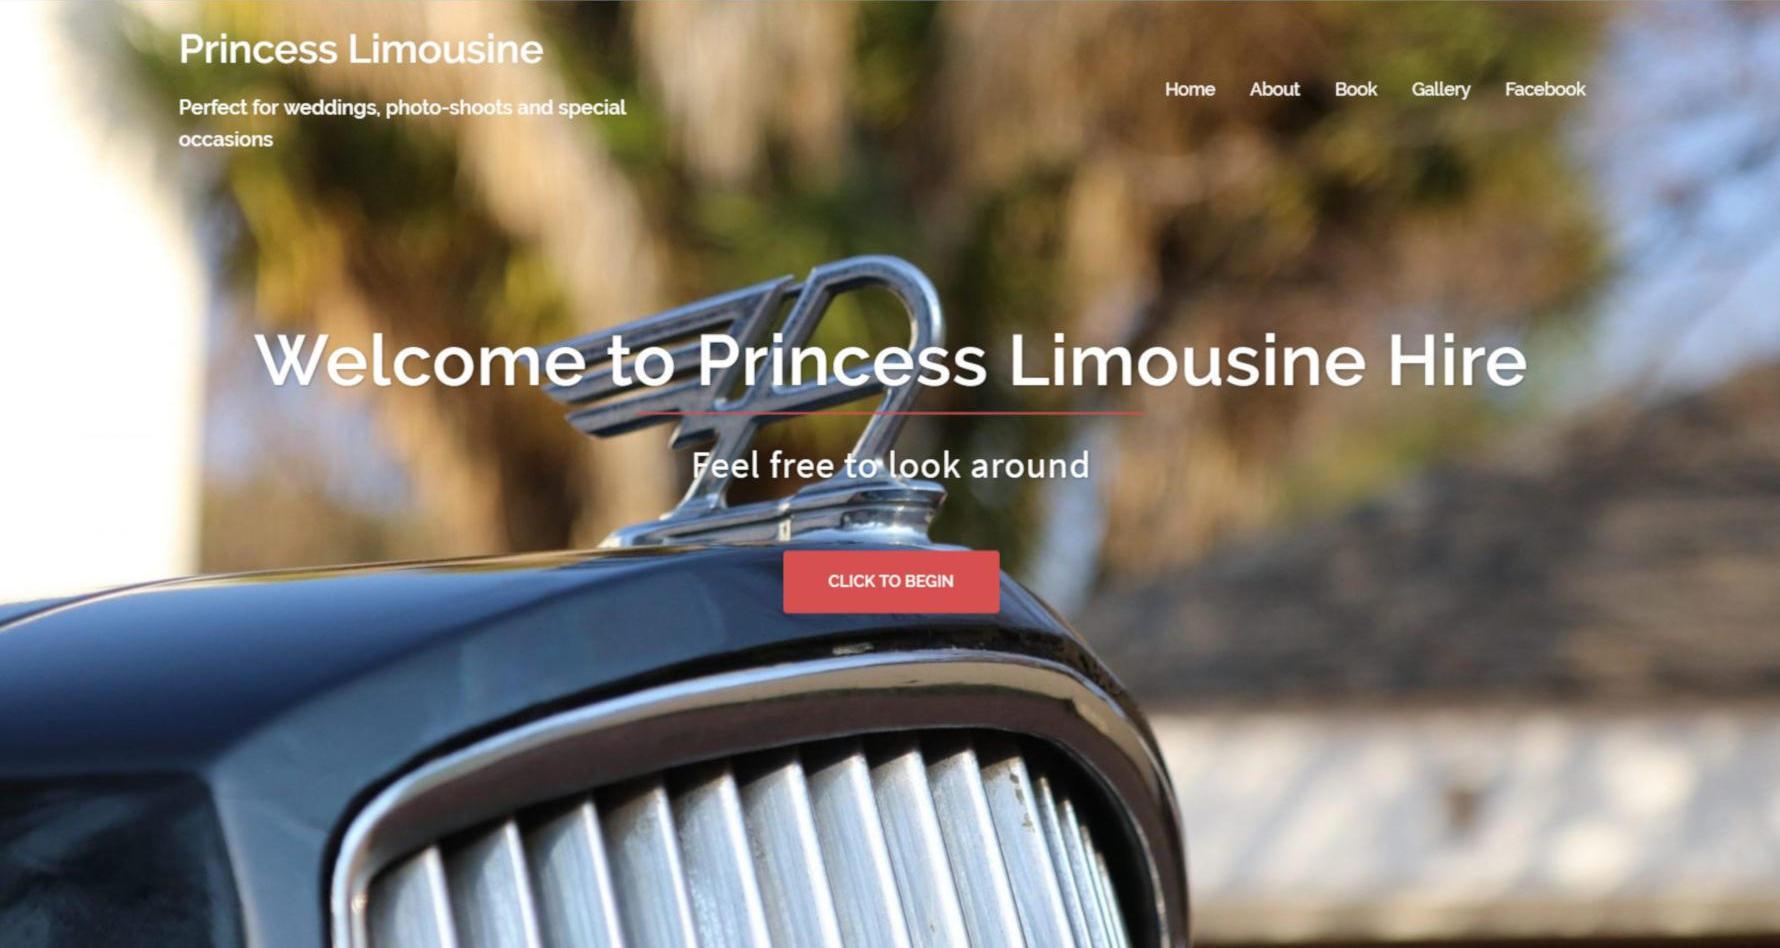 Princess Limousine